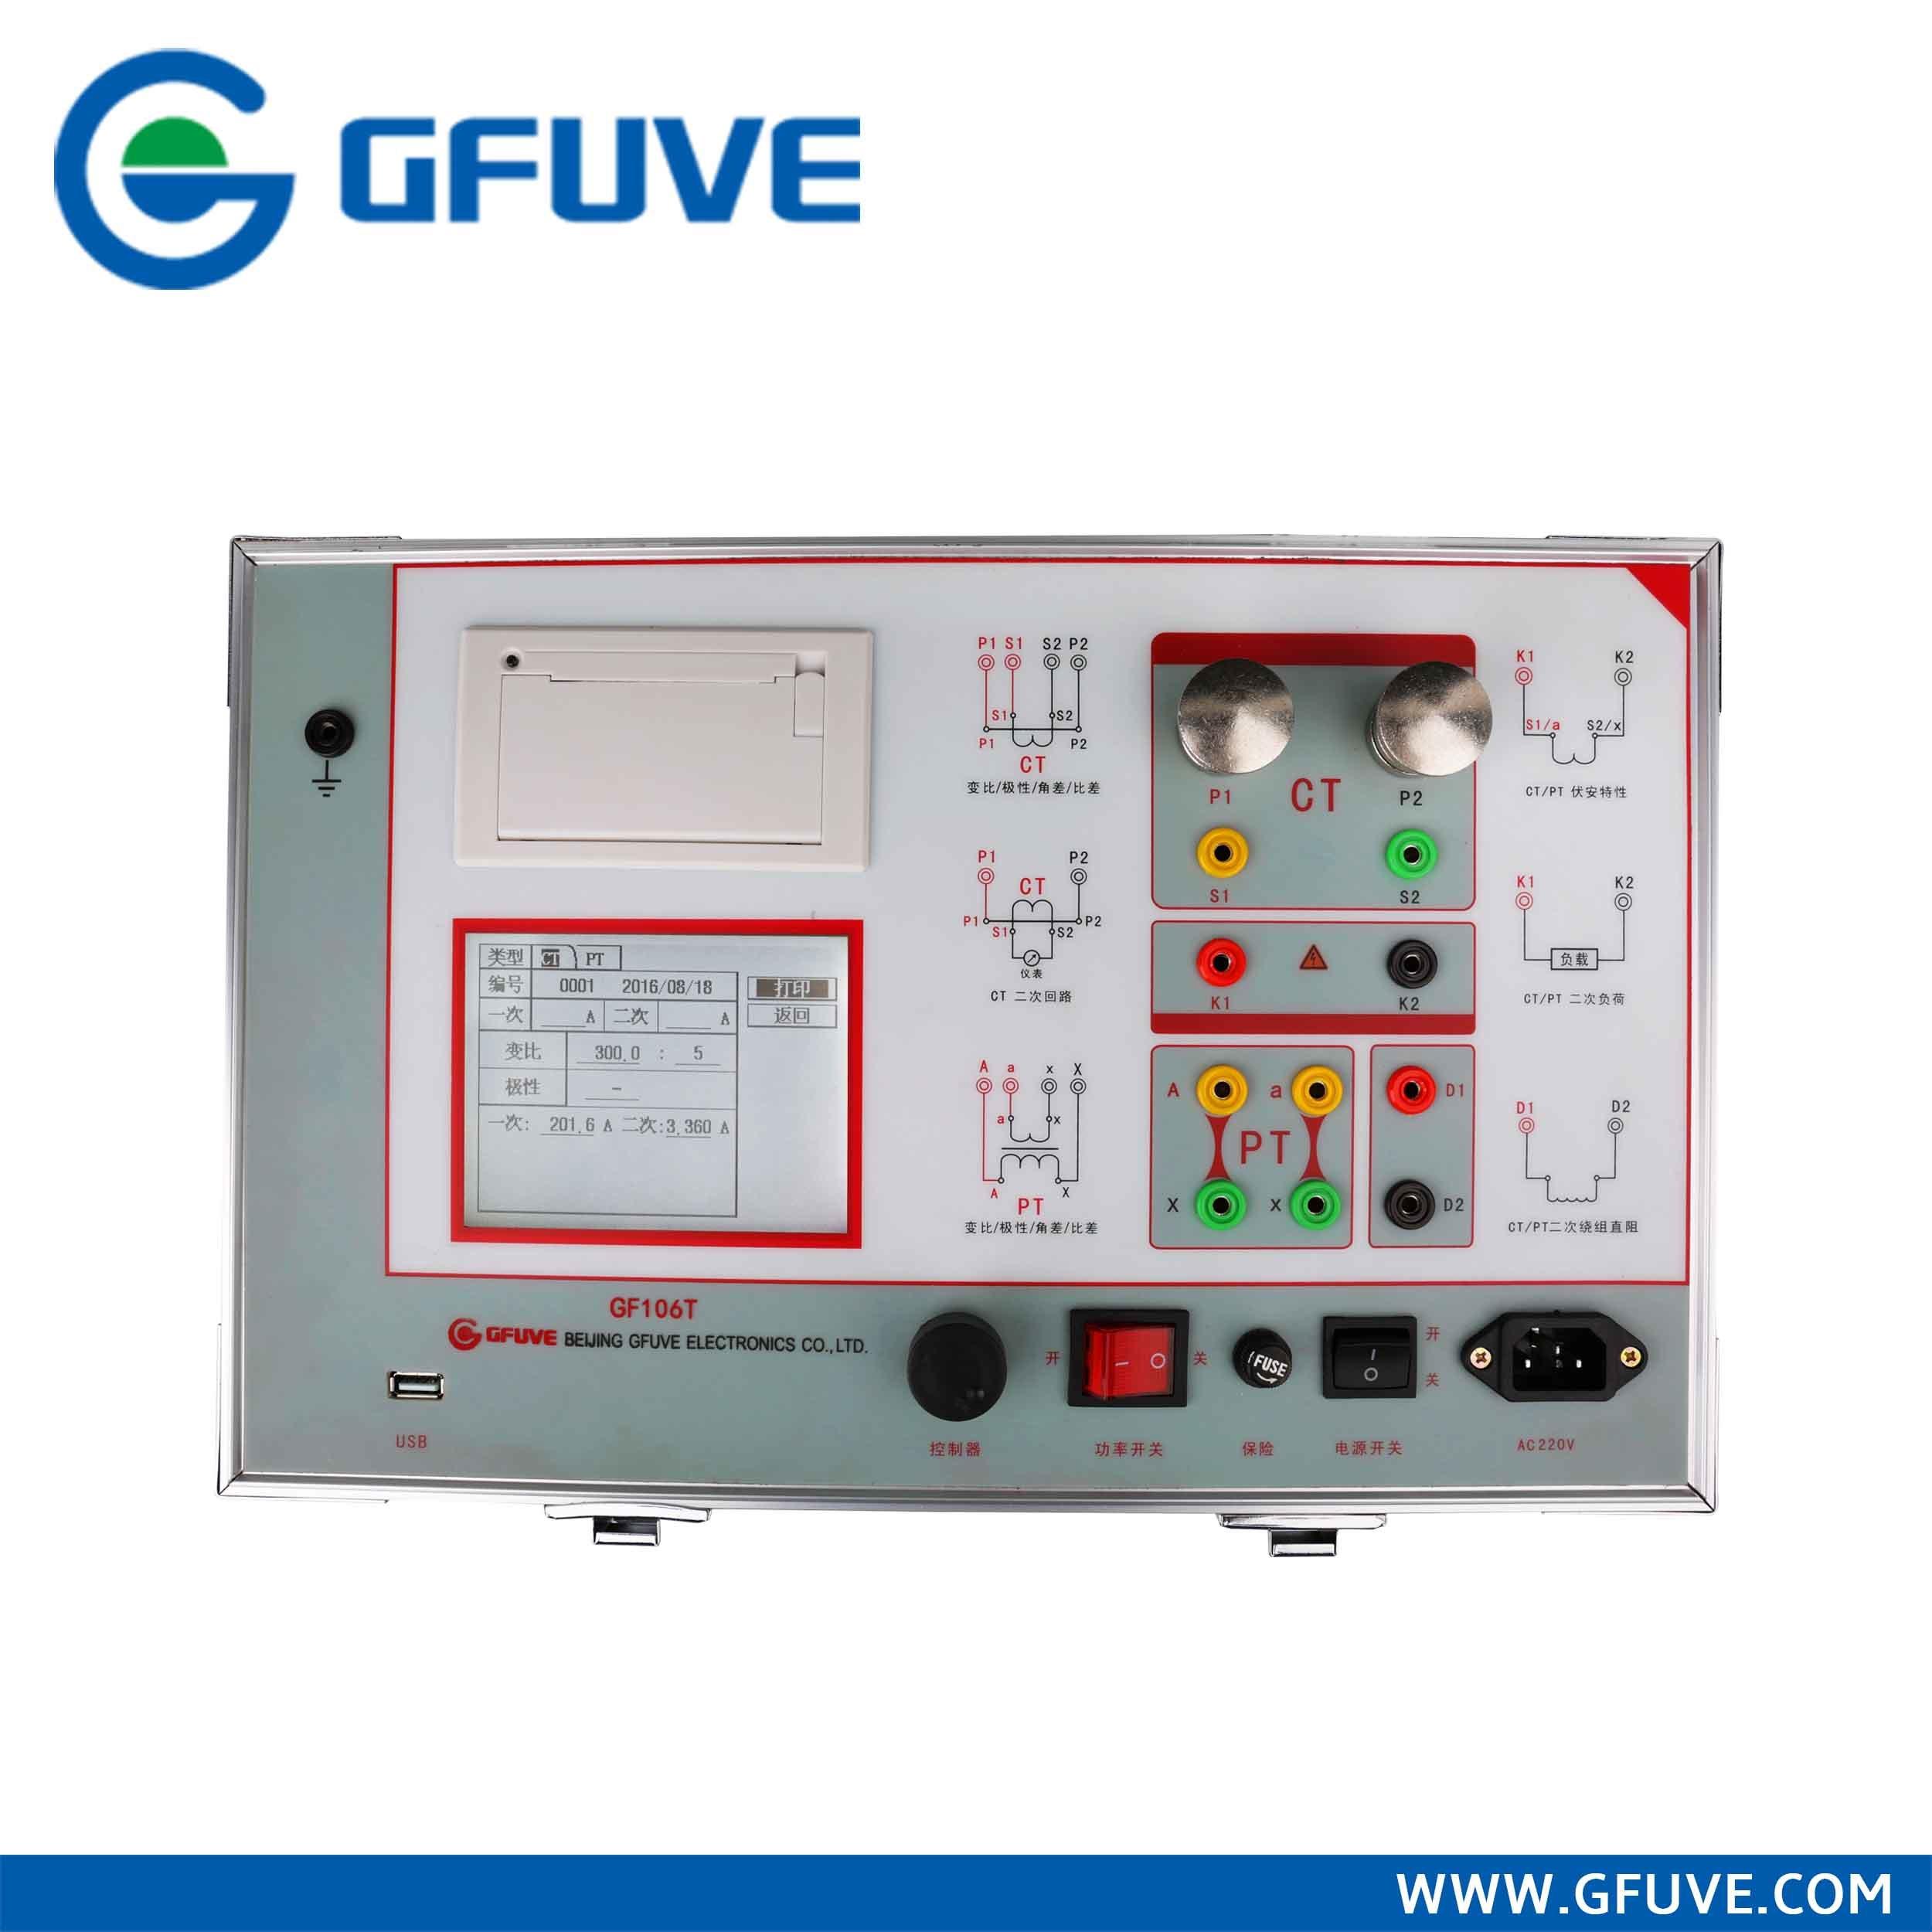 [Hot Item] GF106t USA High Performance Portable PT/CT/Vt Test Kit Set